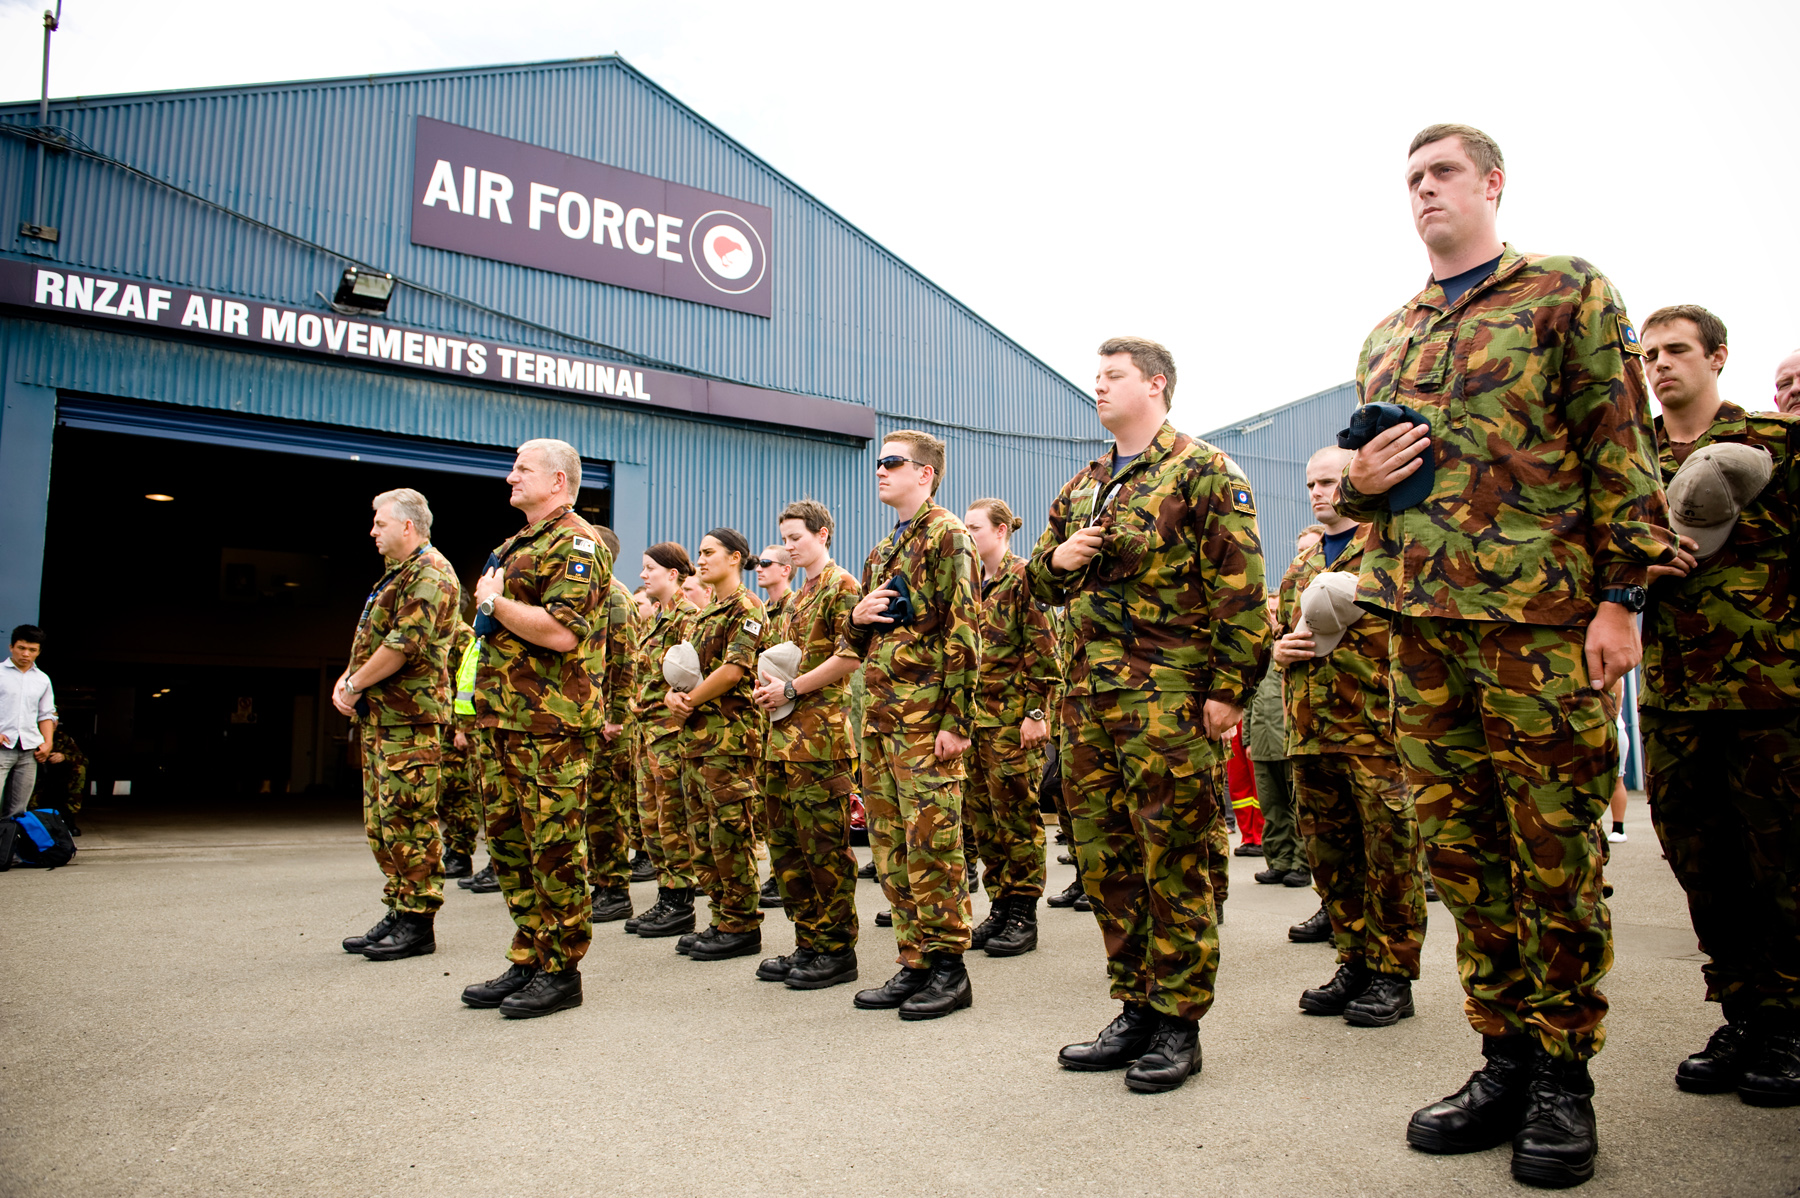 air force 1 army camo nz